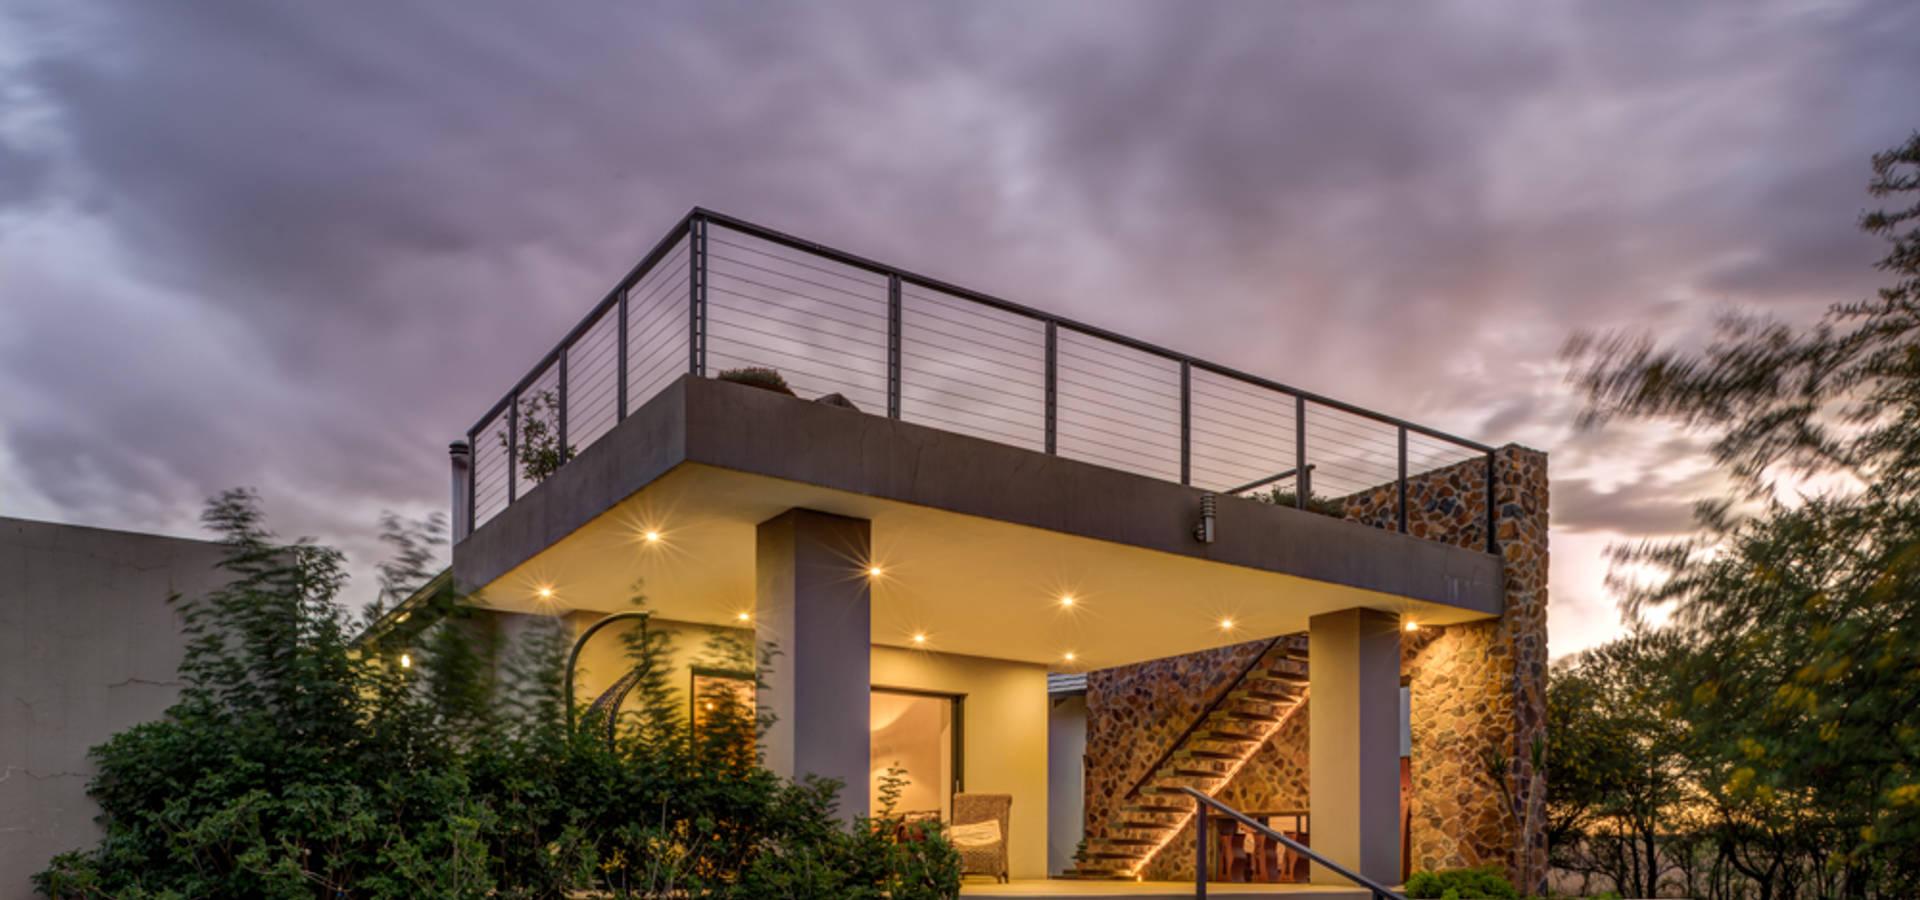 OLIVEHILL Architects